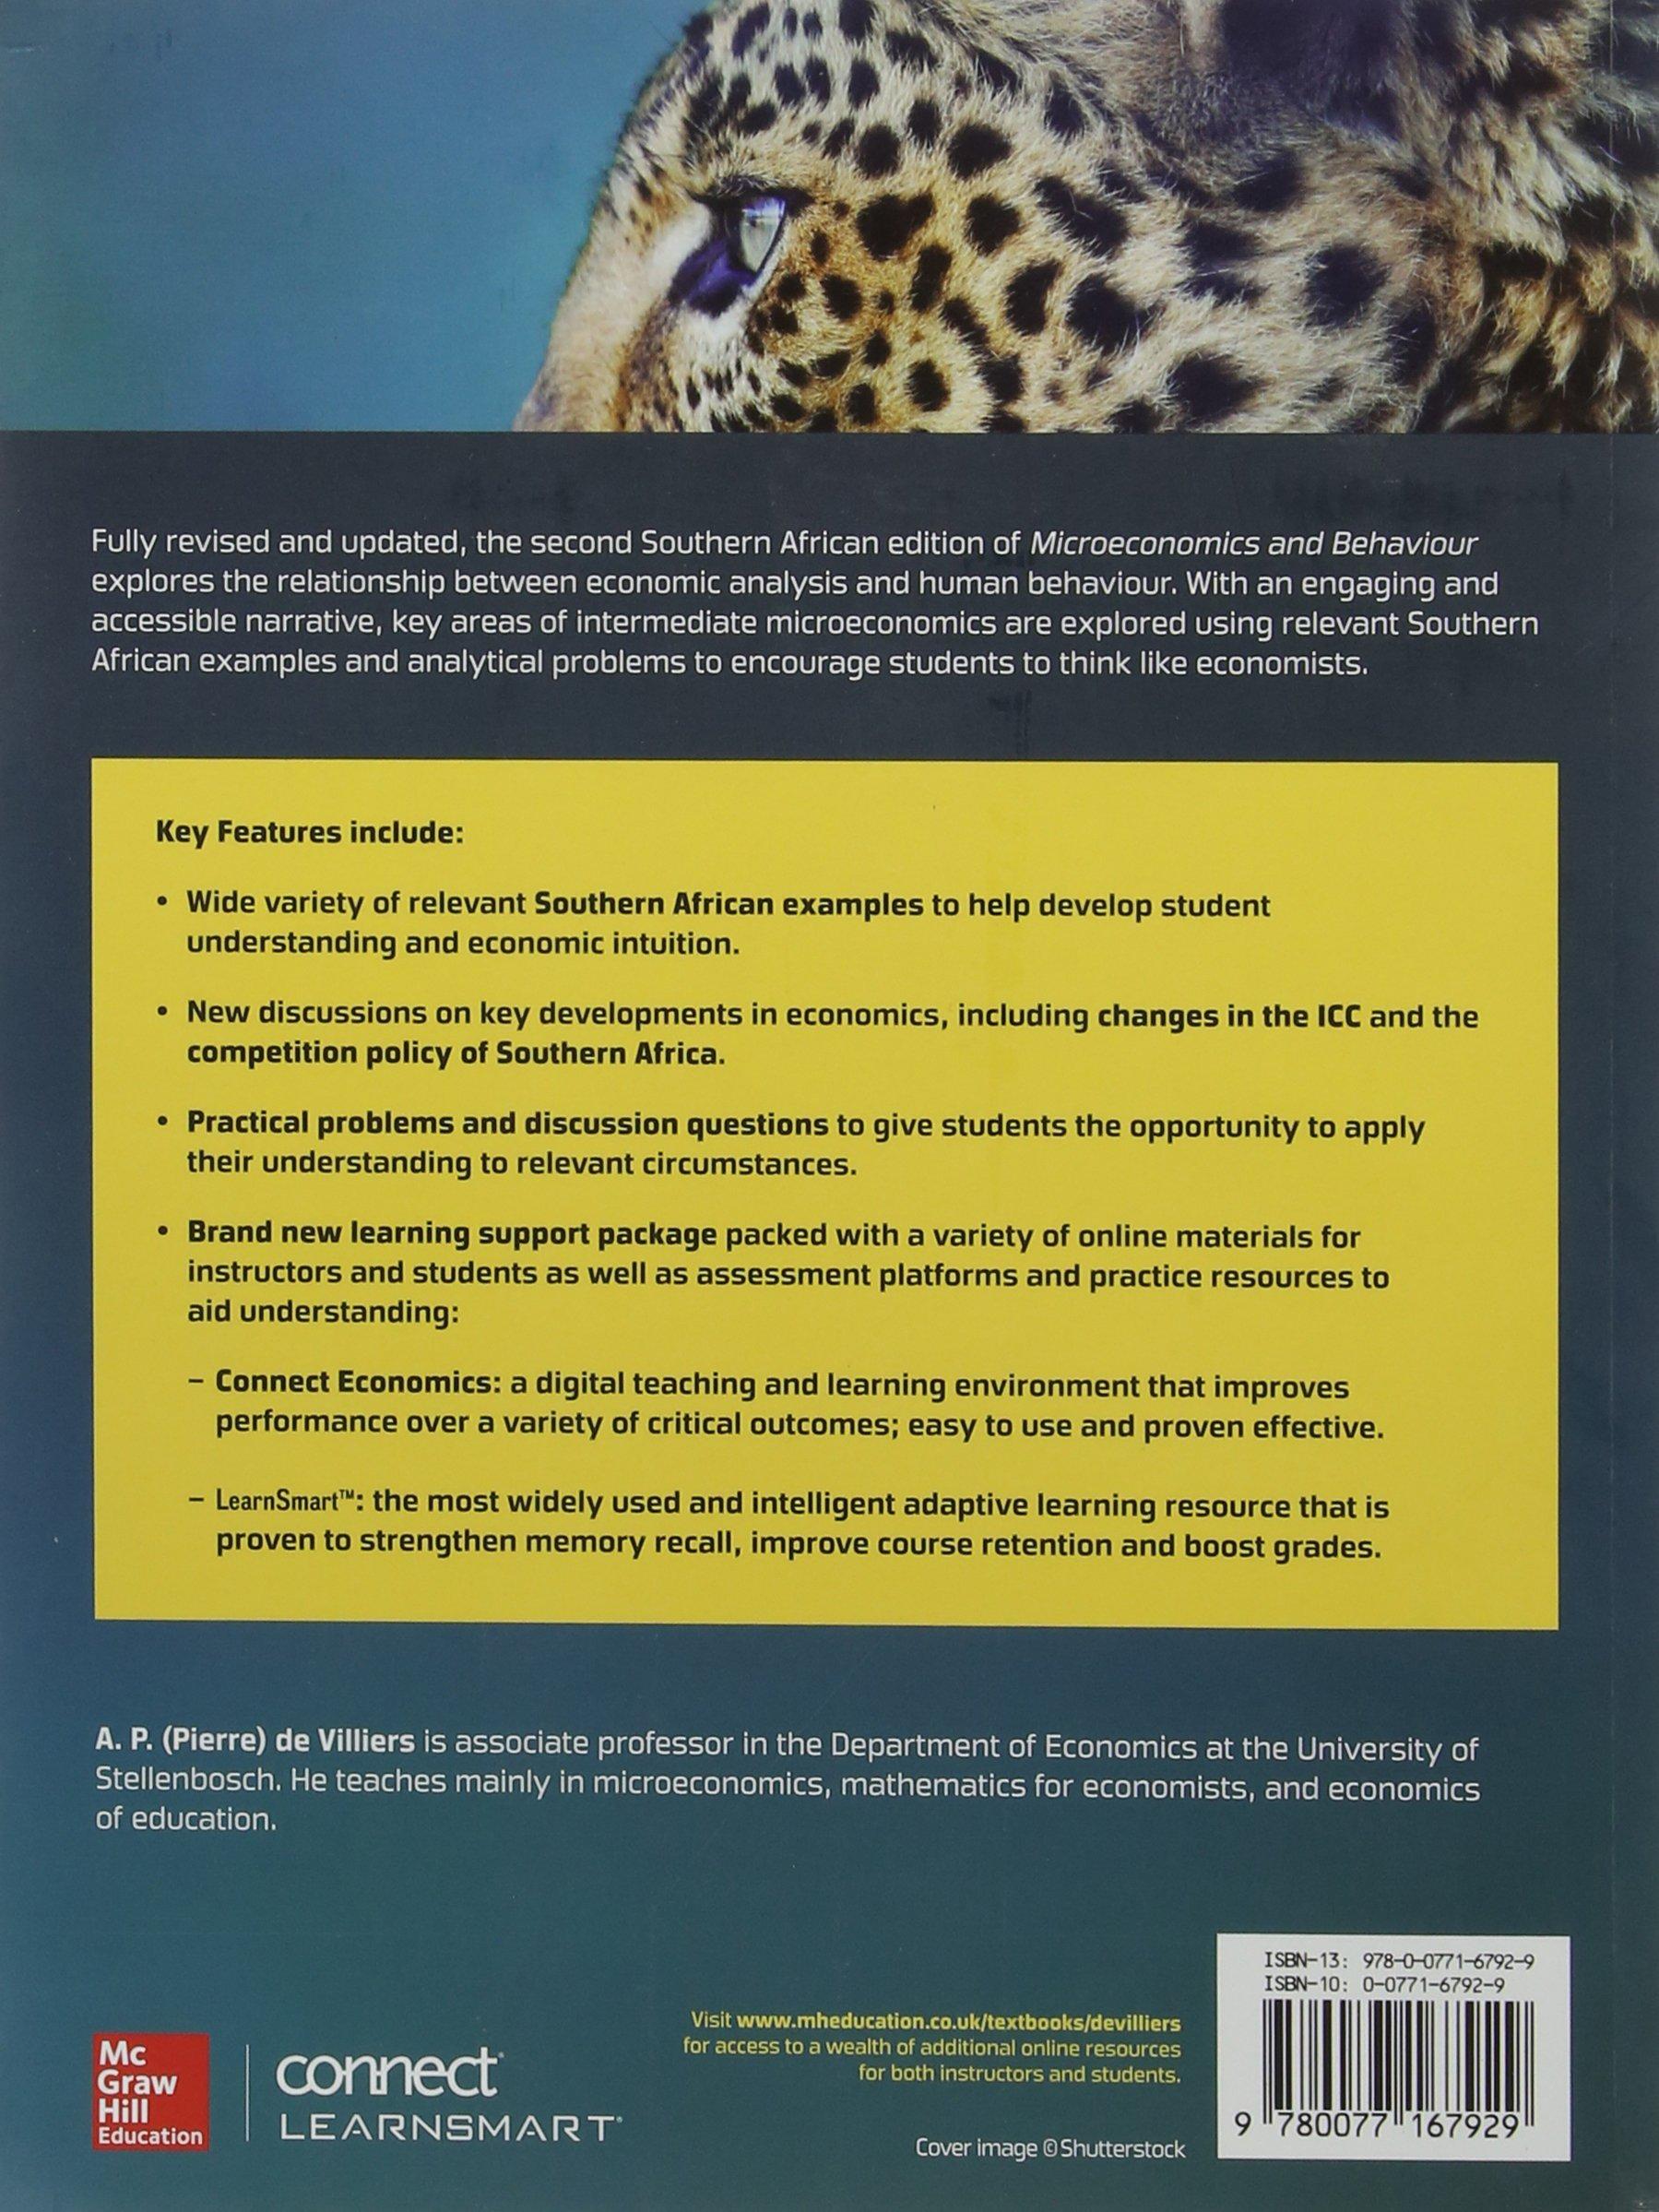 Microeconomics and Behaviour: South African edition: A. Pierre De Villiers,  Robert H. Frank: 9780077167929: Amazon.com: Books